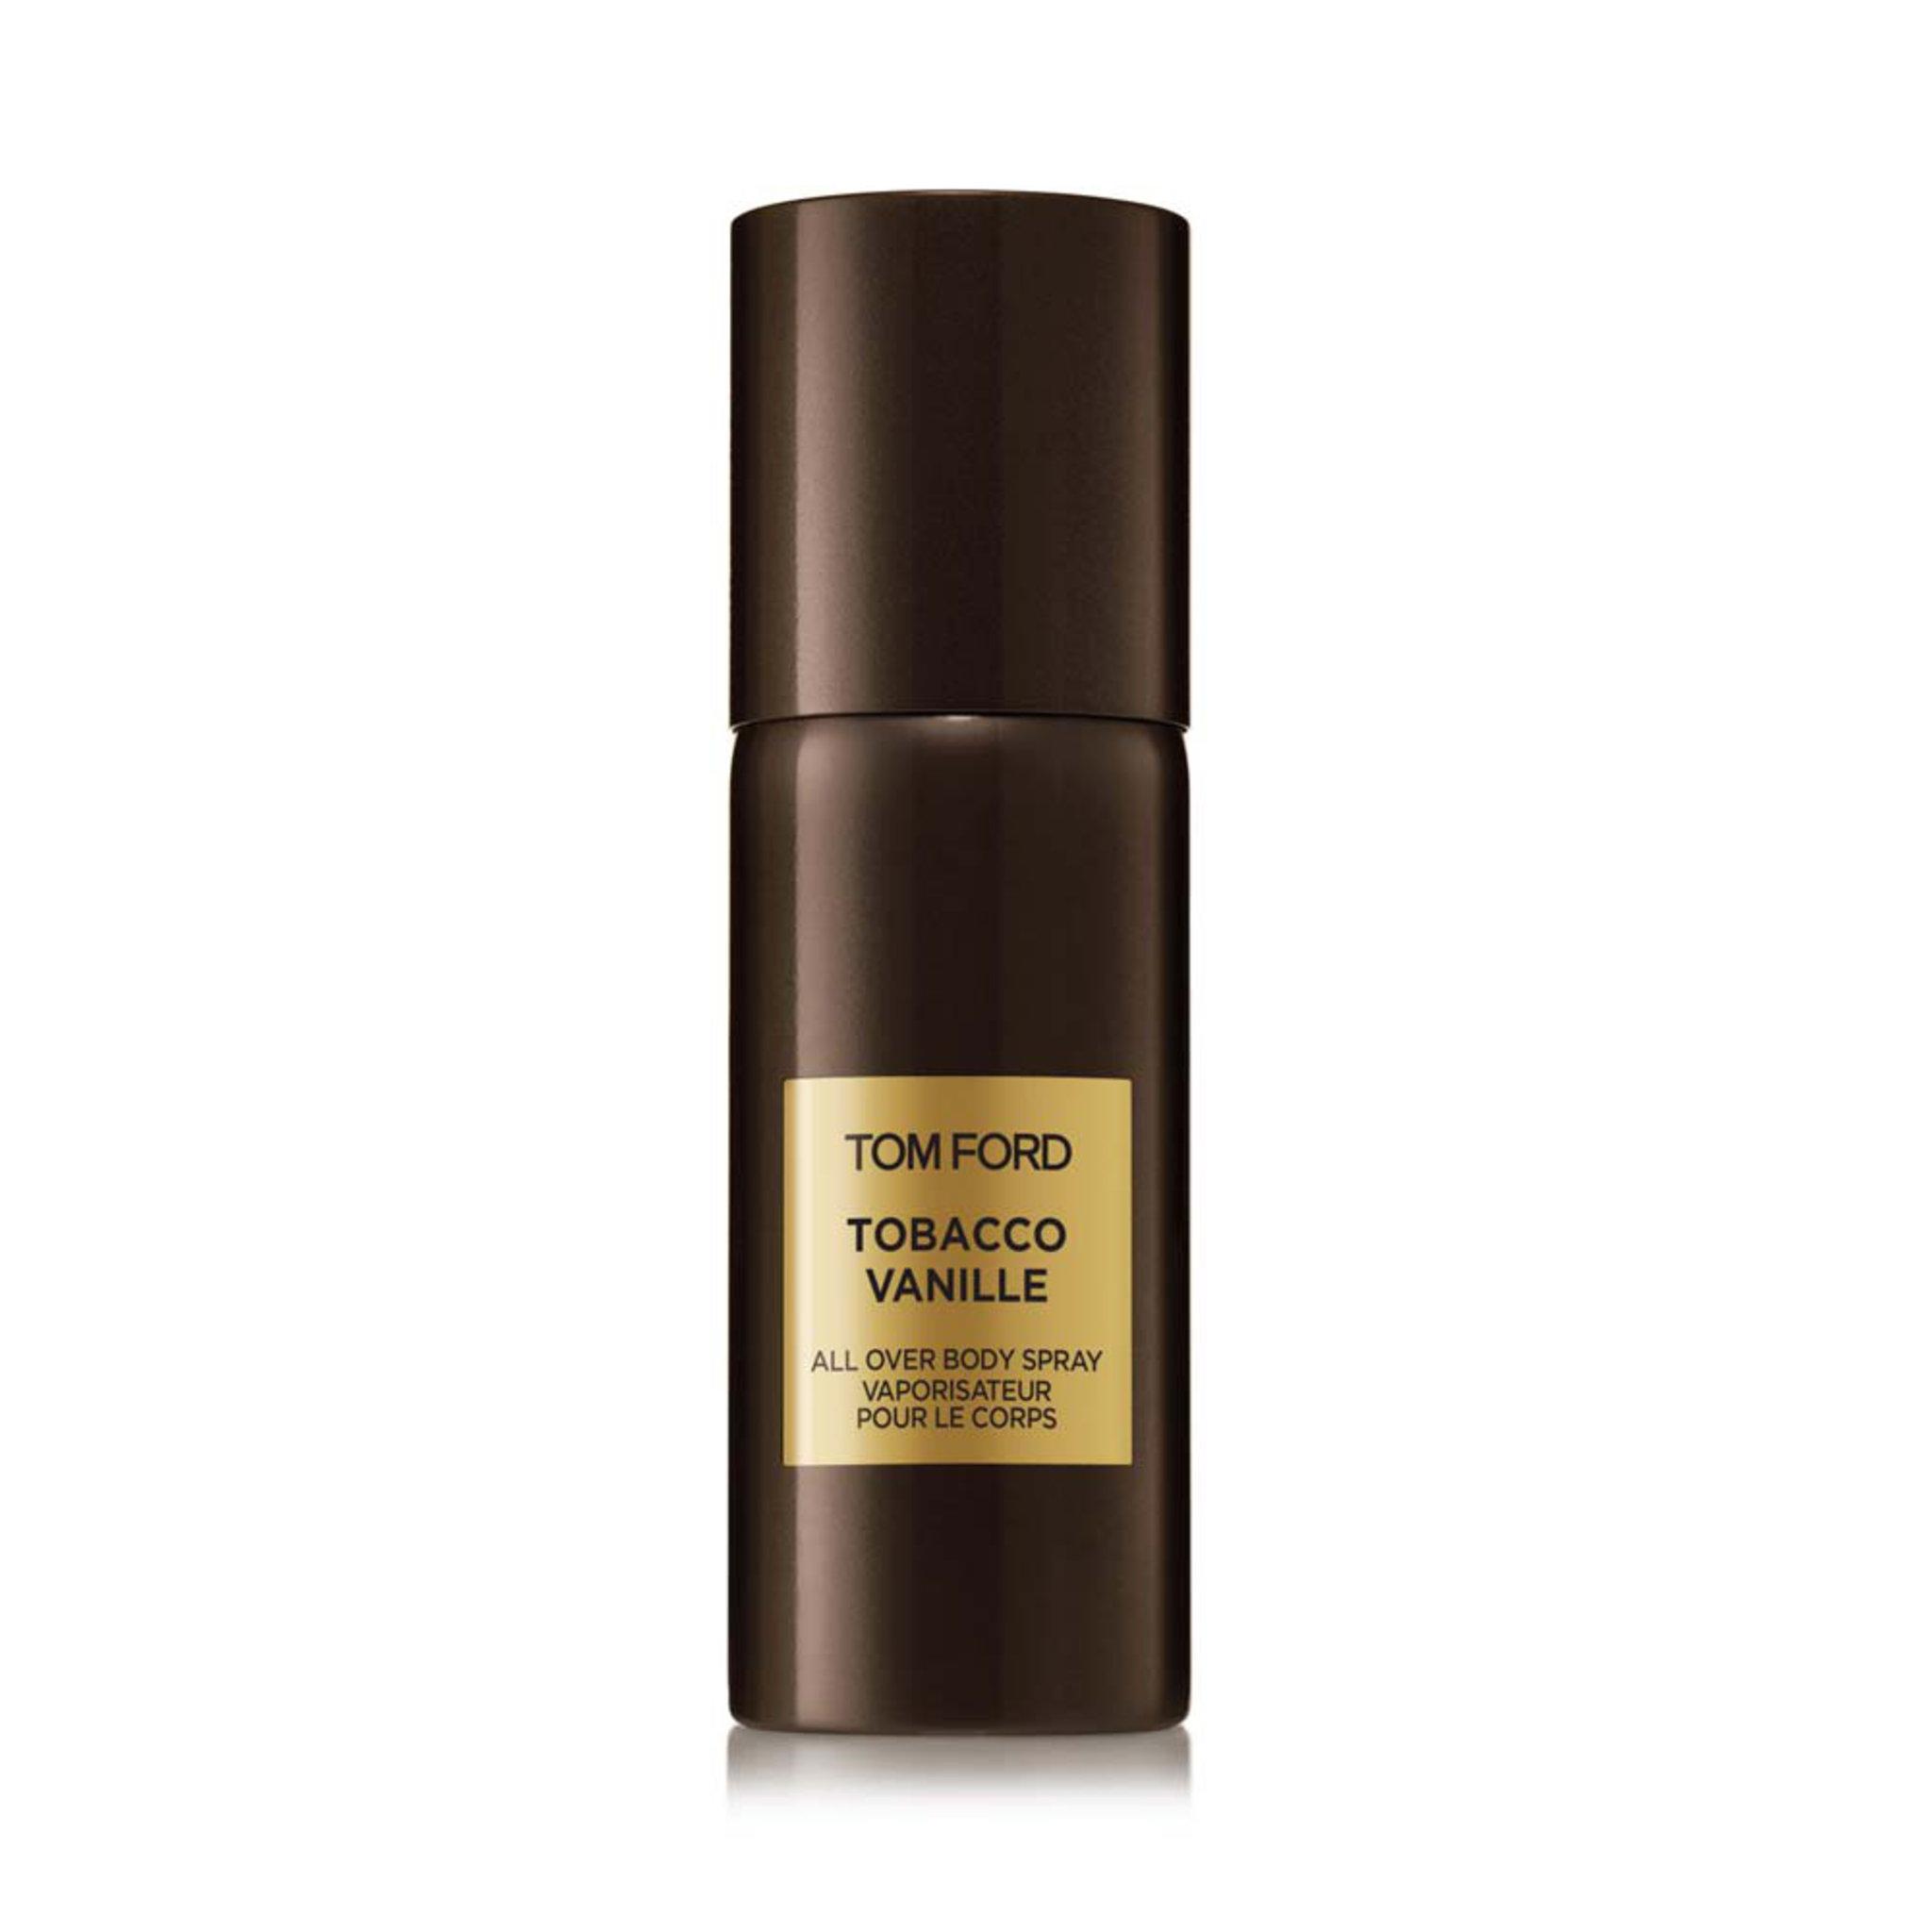 Tobacco Vanille All Over Body Spray, 150 ML